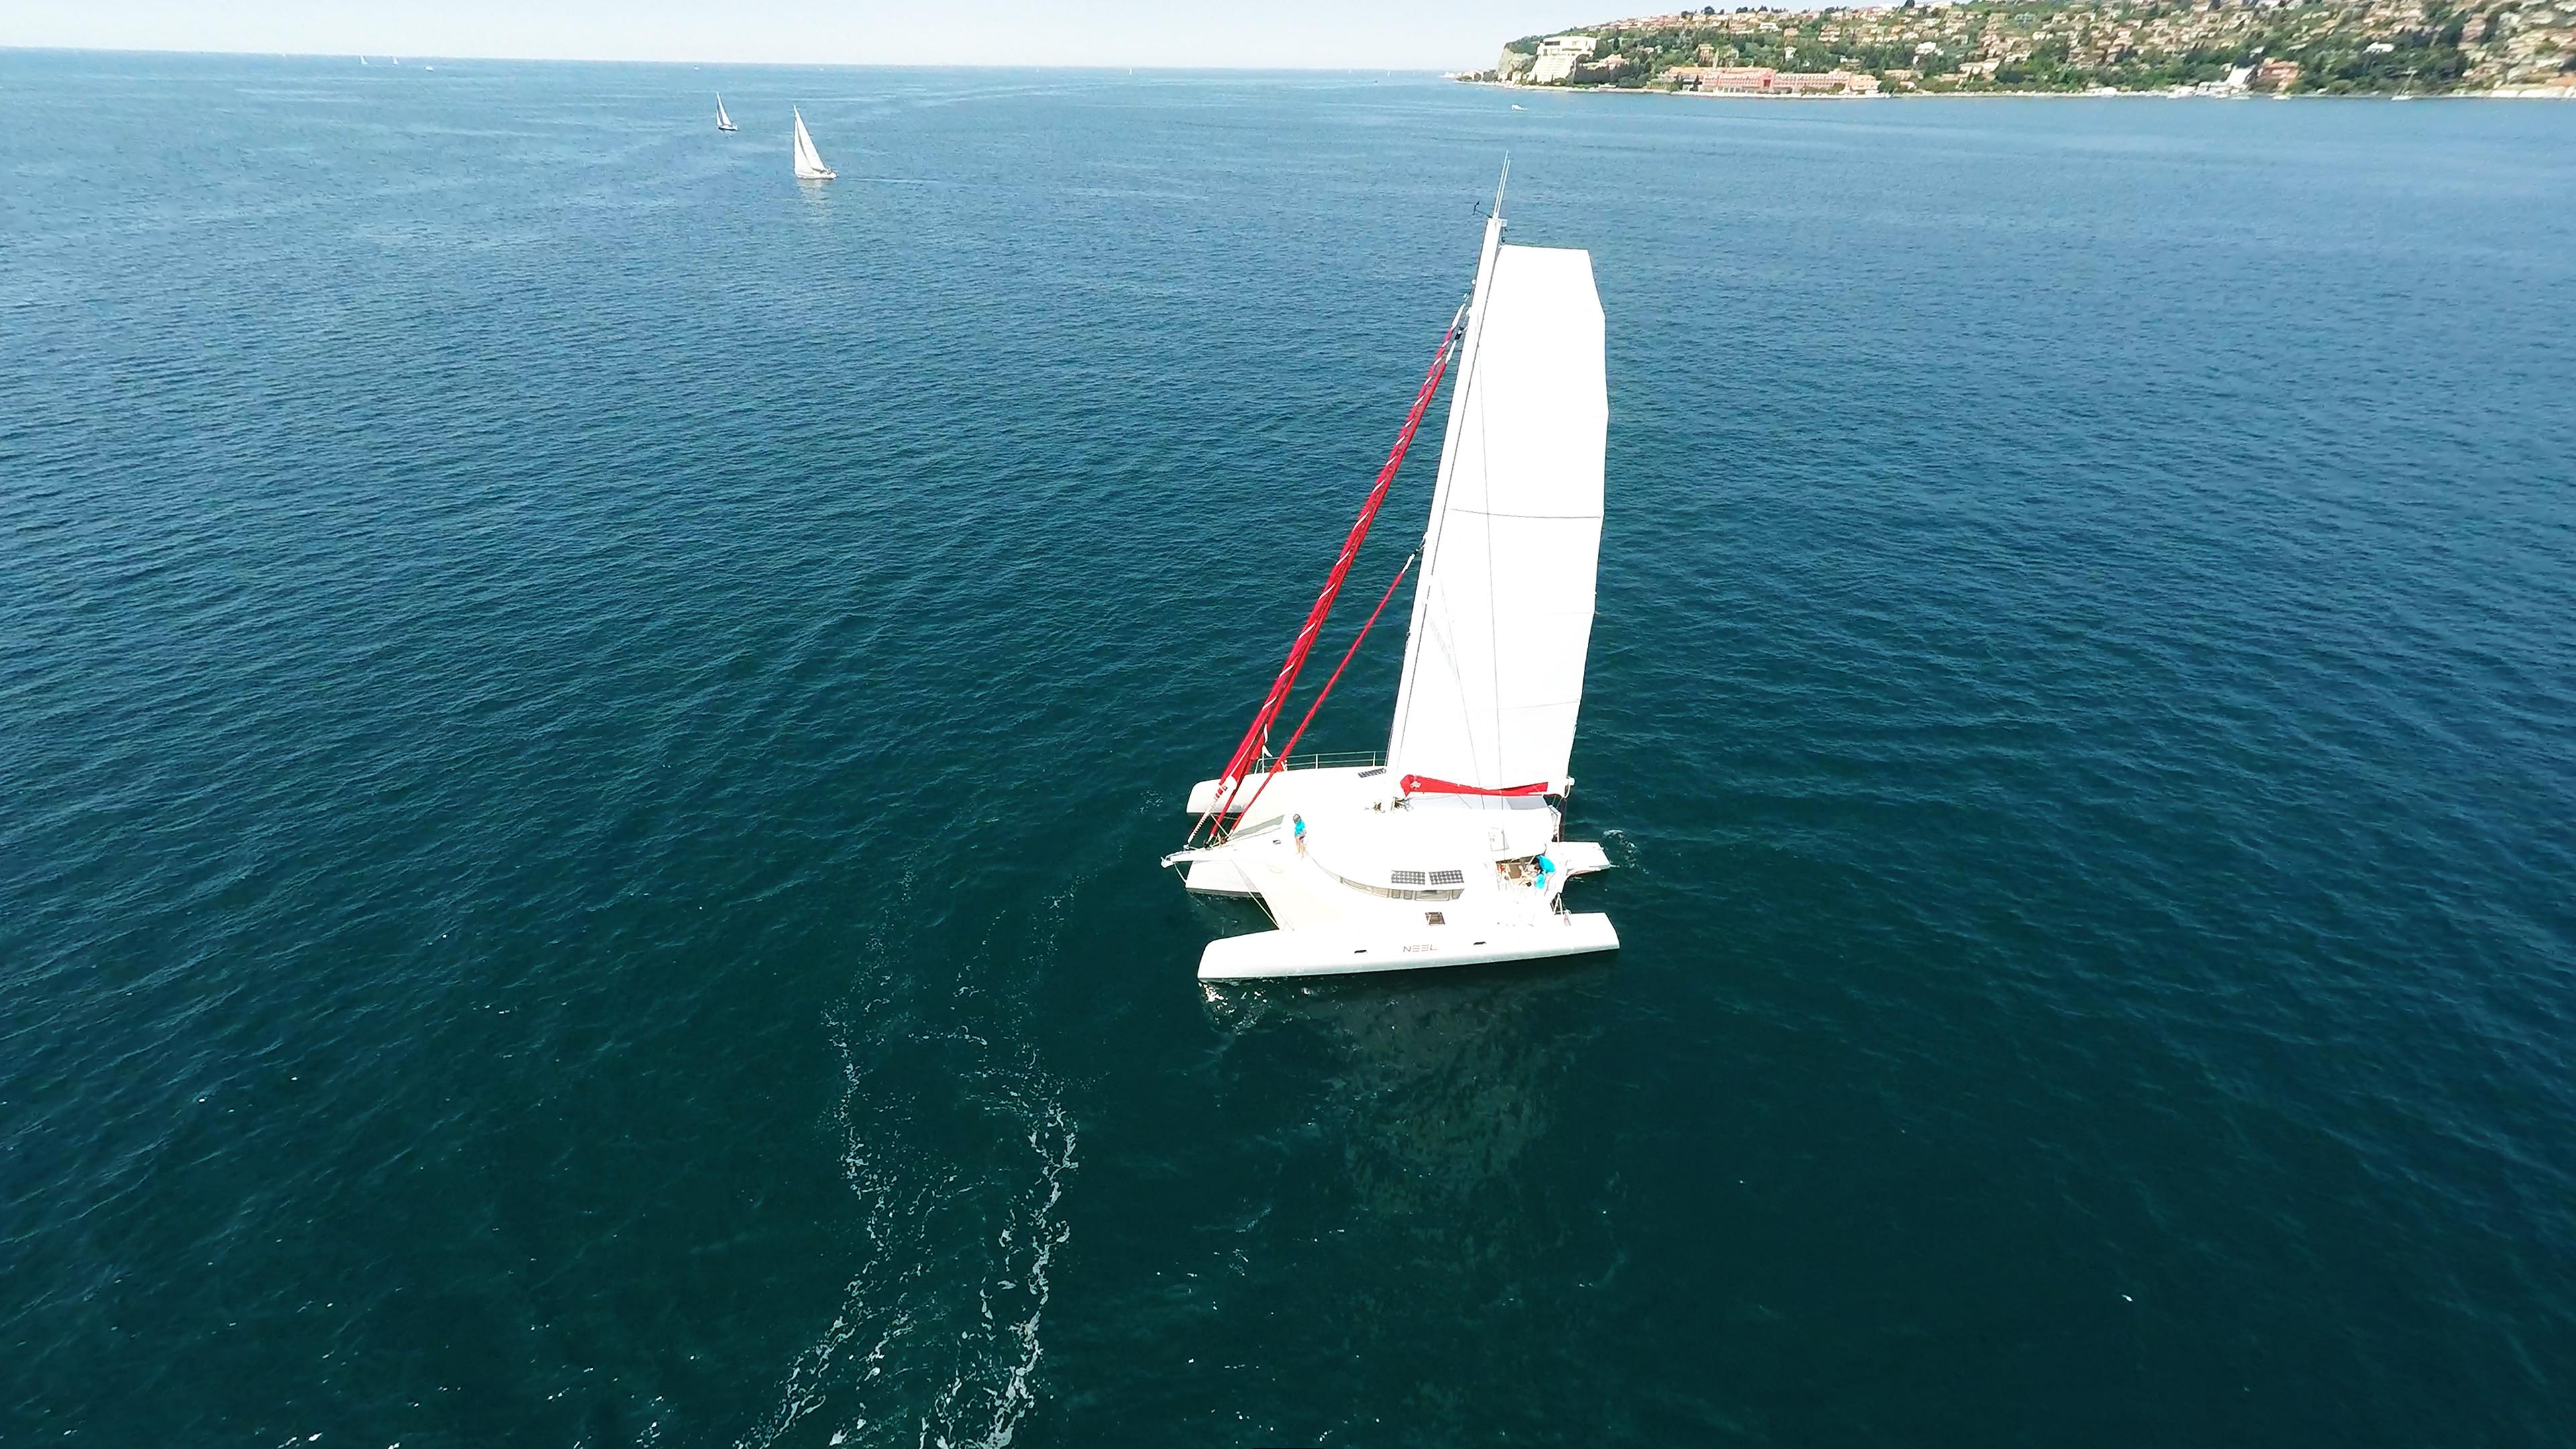 trimaran main sail at sea sailing